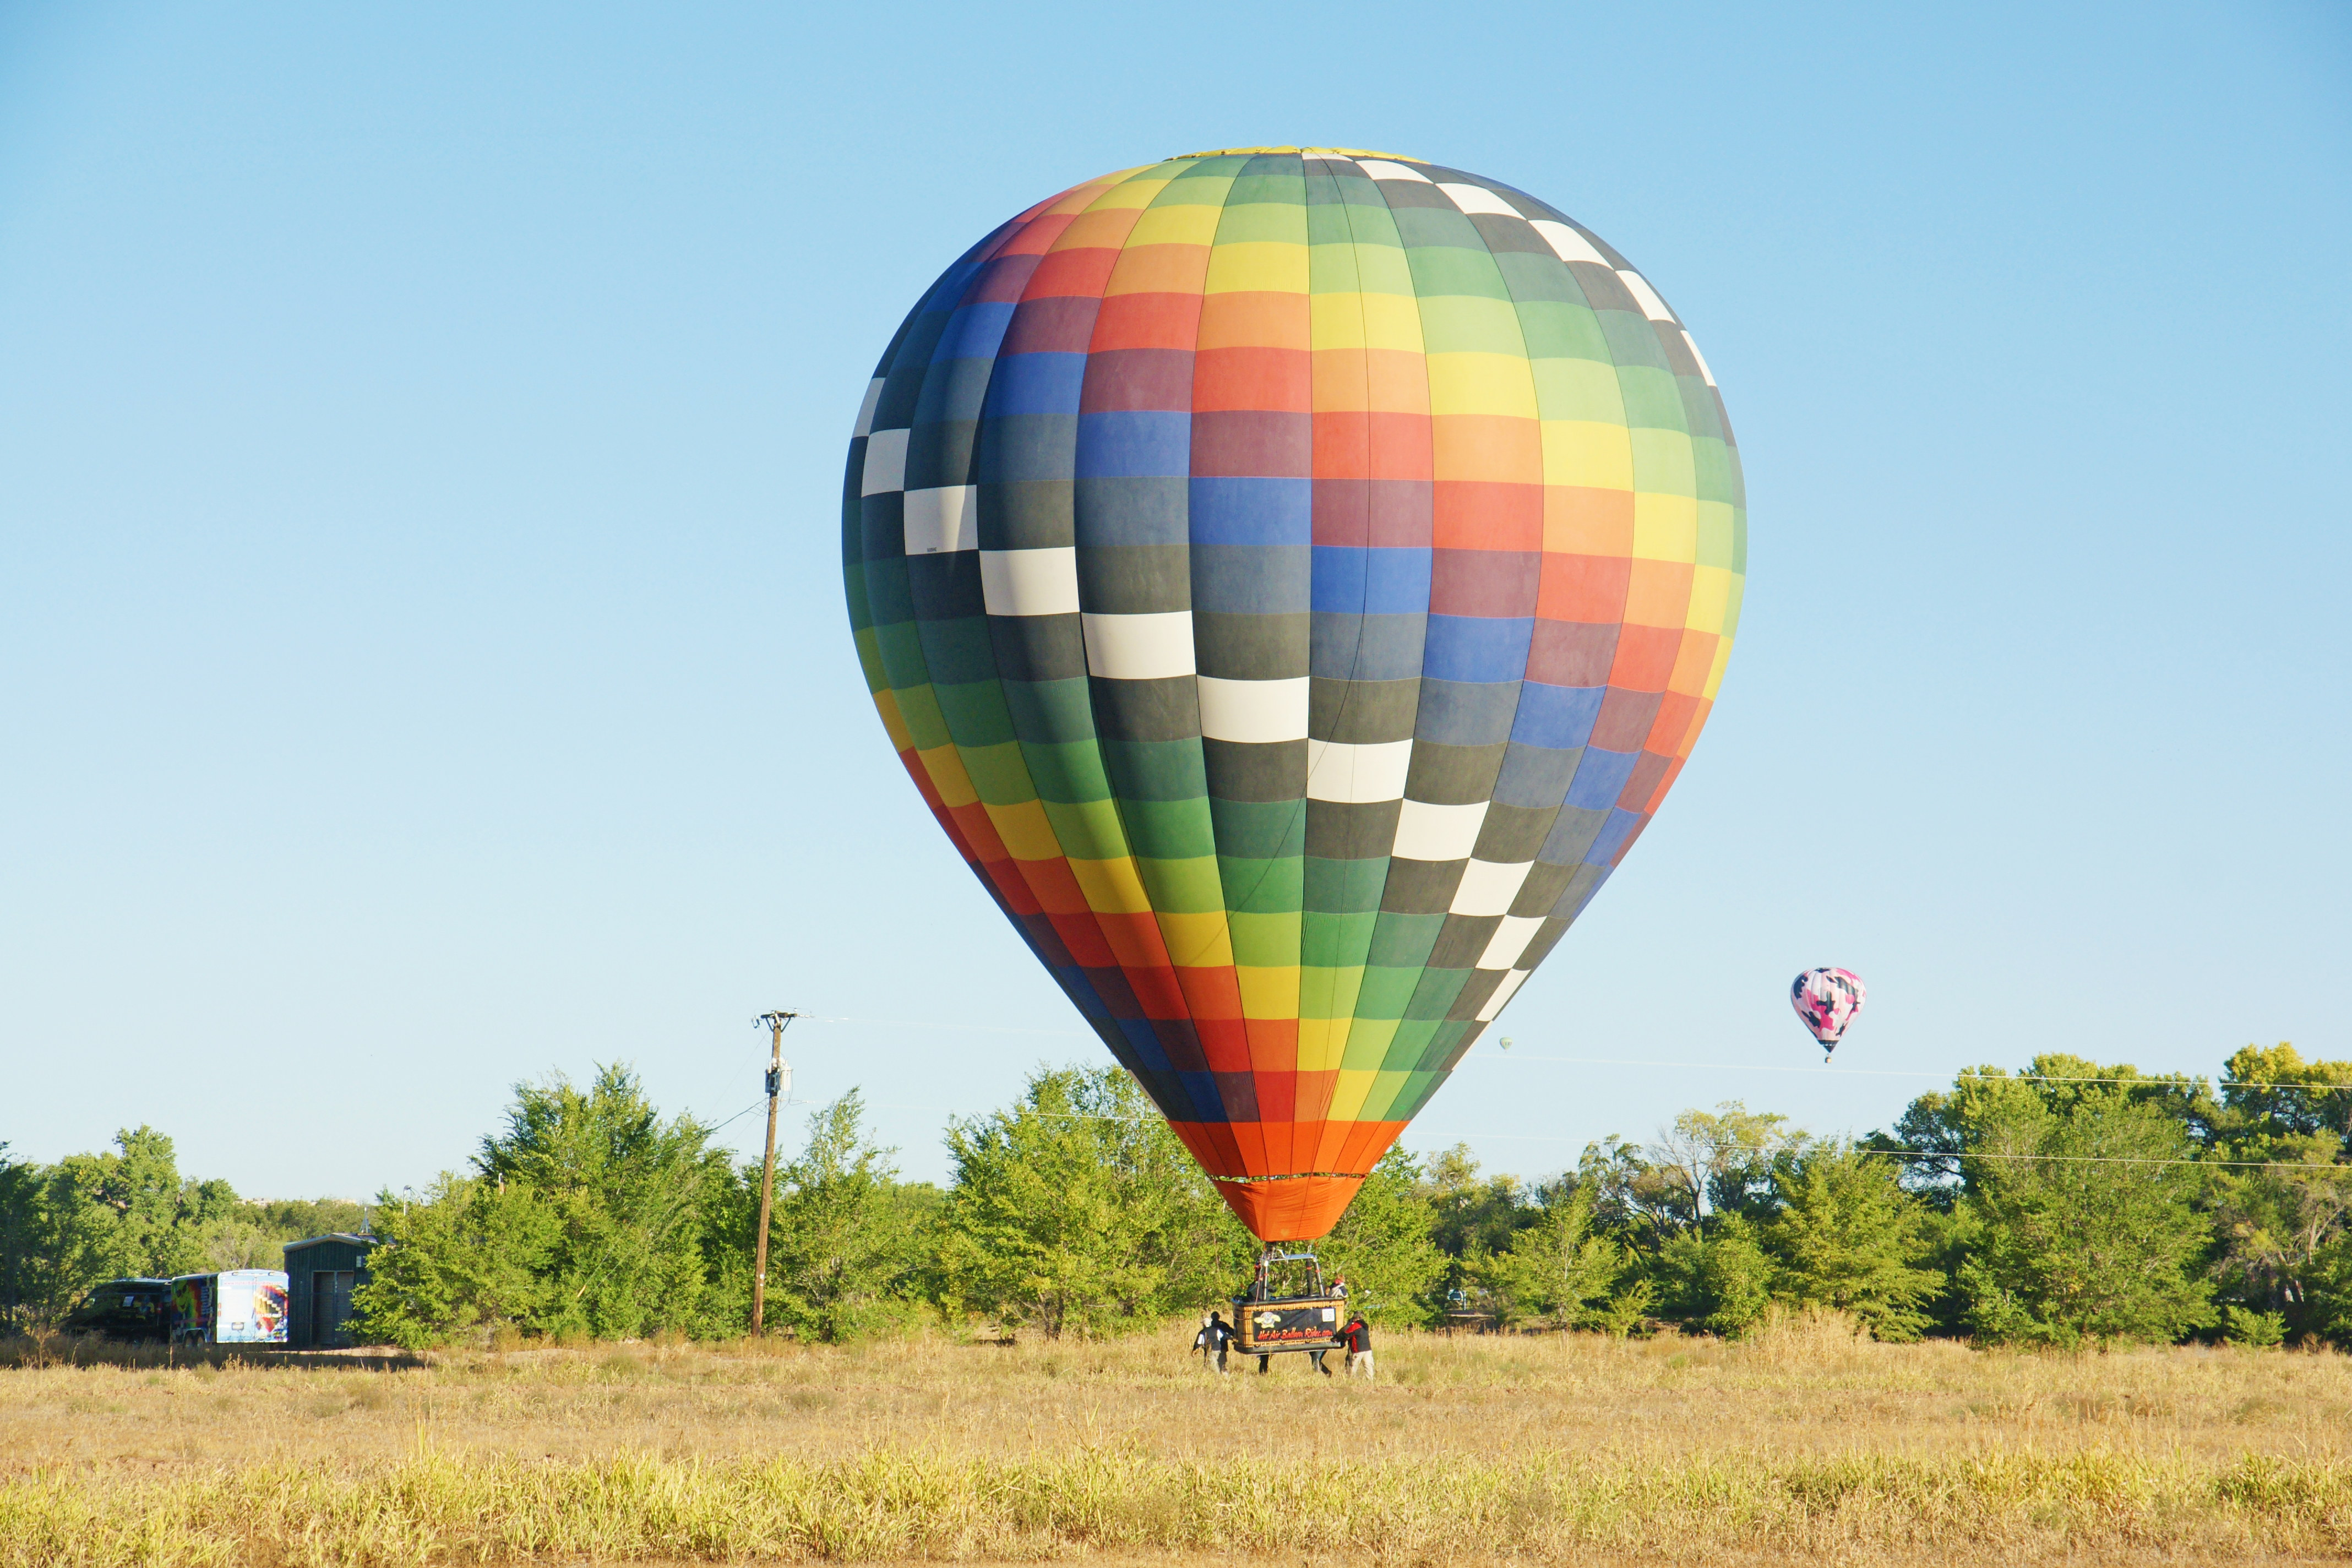 aibf-Balloon-Descent-Gallery10